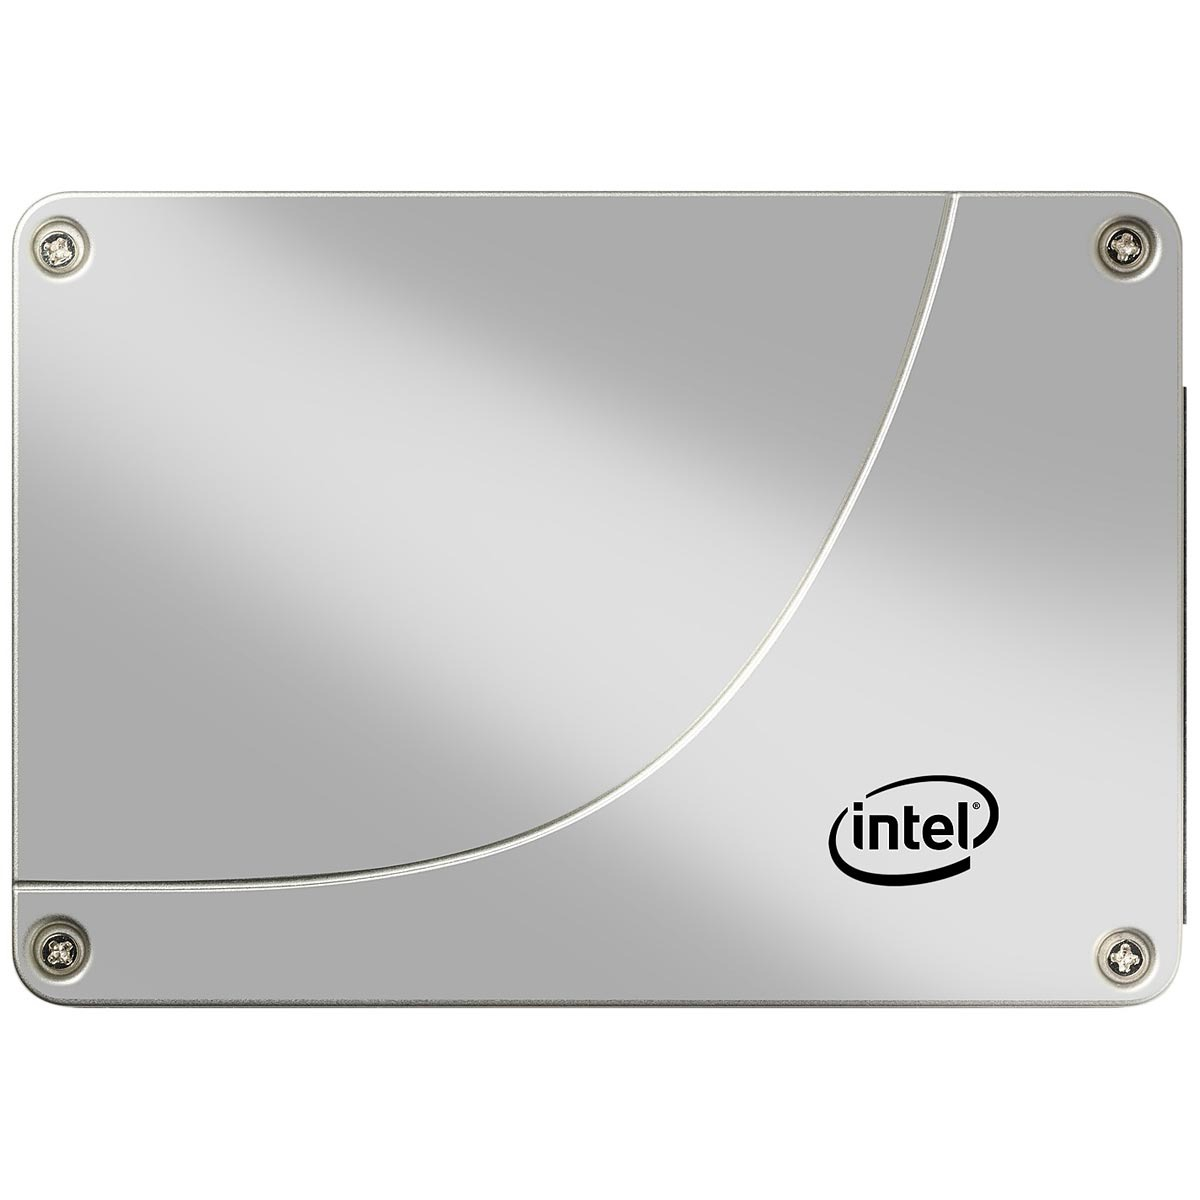 "Disque SSD Intel Solid-State Drive 320 Series 120 Go SATA II 3Gb/s OEM SSD 120 Go 2.5"" 9.5 mm MLC Serial ATA II (Postville Refresh) - OEM"